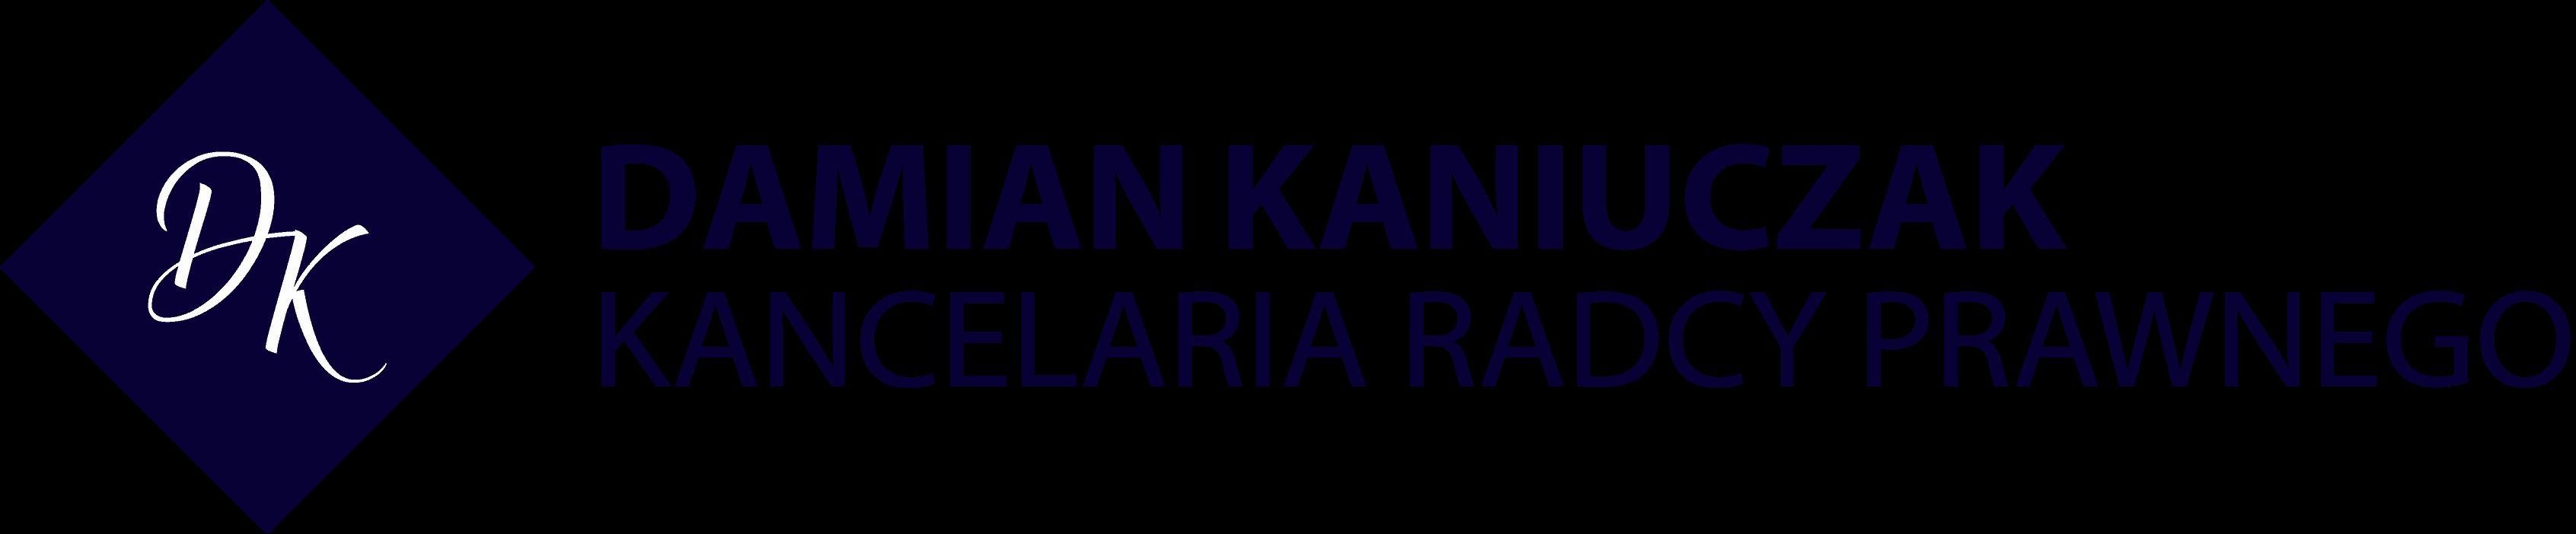 Kancelaria Radcy Prawnego Damian Kaniuczak